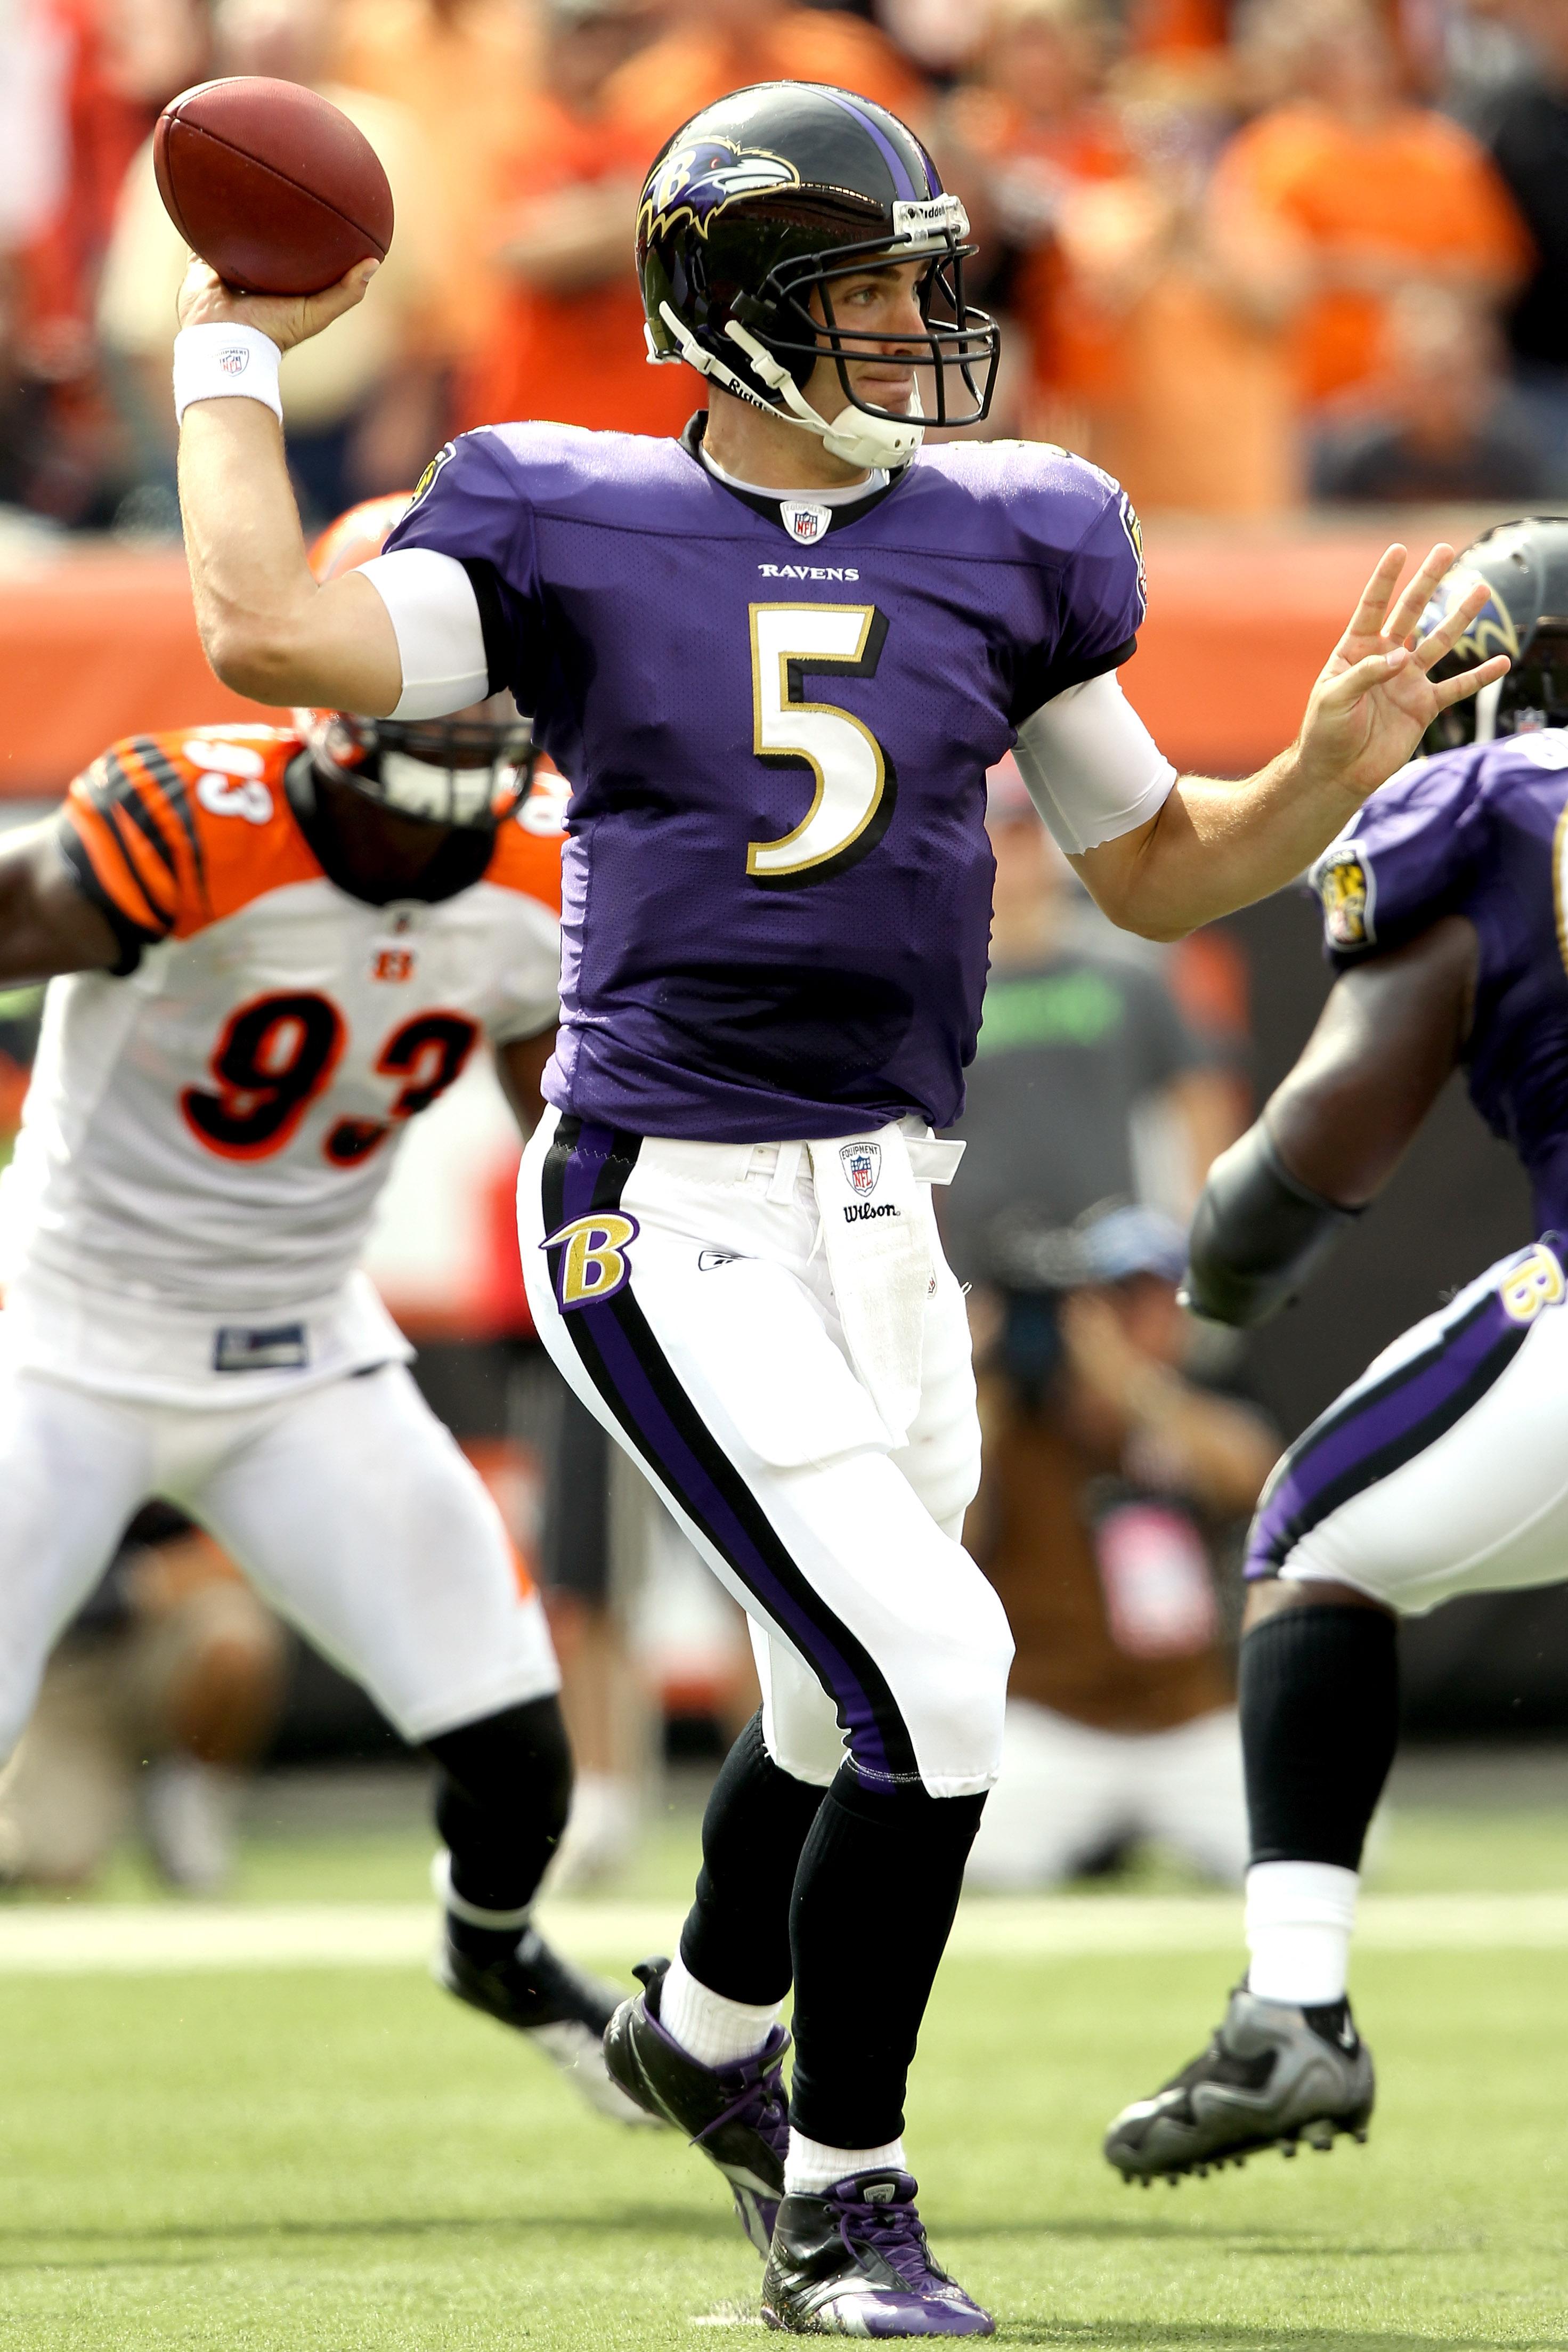 CINCINNATI - SEPTEMBER 19:  Quarterback Joe Flacco #5 of Baltimore Ravens throws against the Cincinnati Bengals at Paul Brown Stadium on September 19, 2010 in Cincinnati, Ohio.  (Photo by Matthew Stockman/Getty Images)